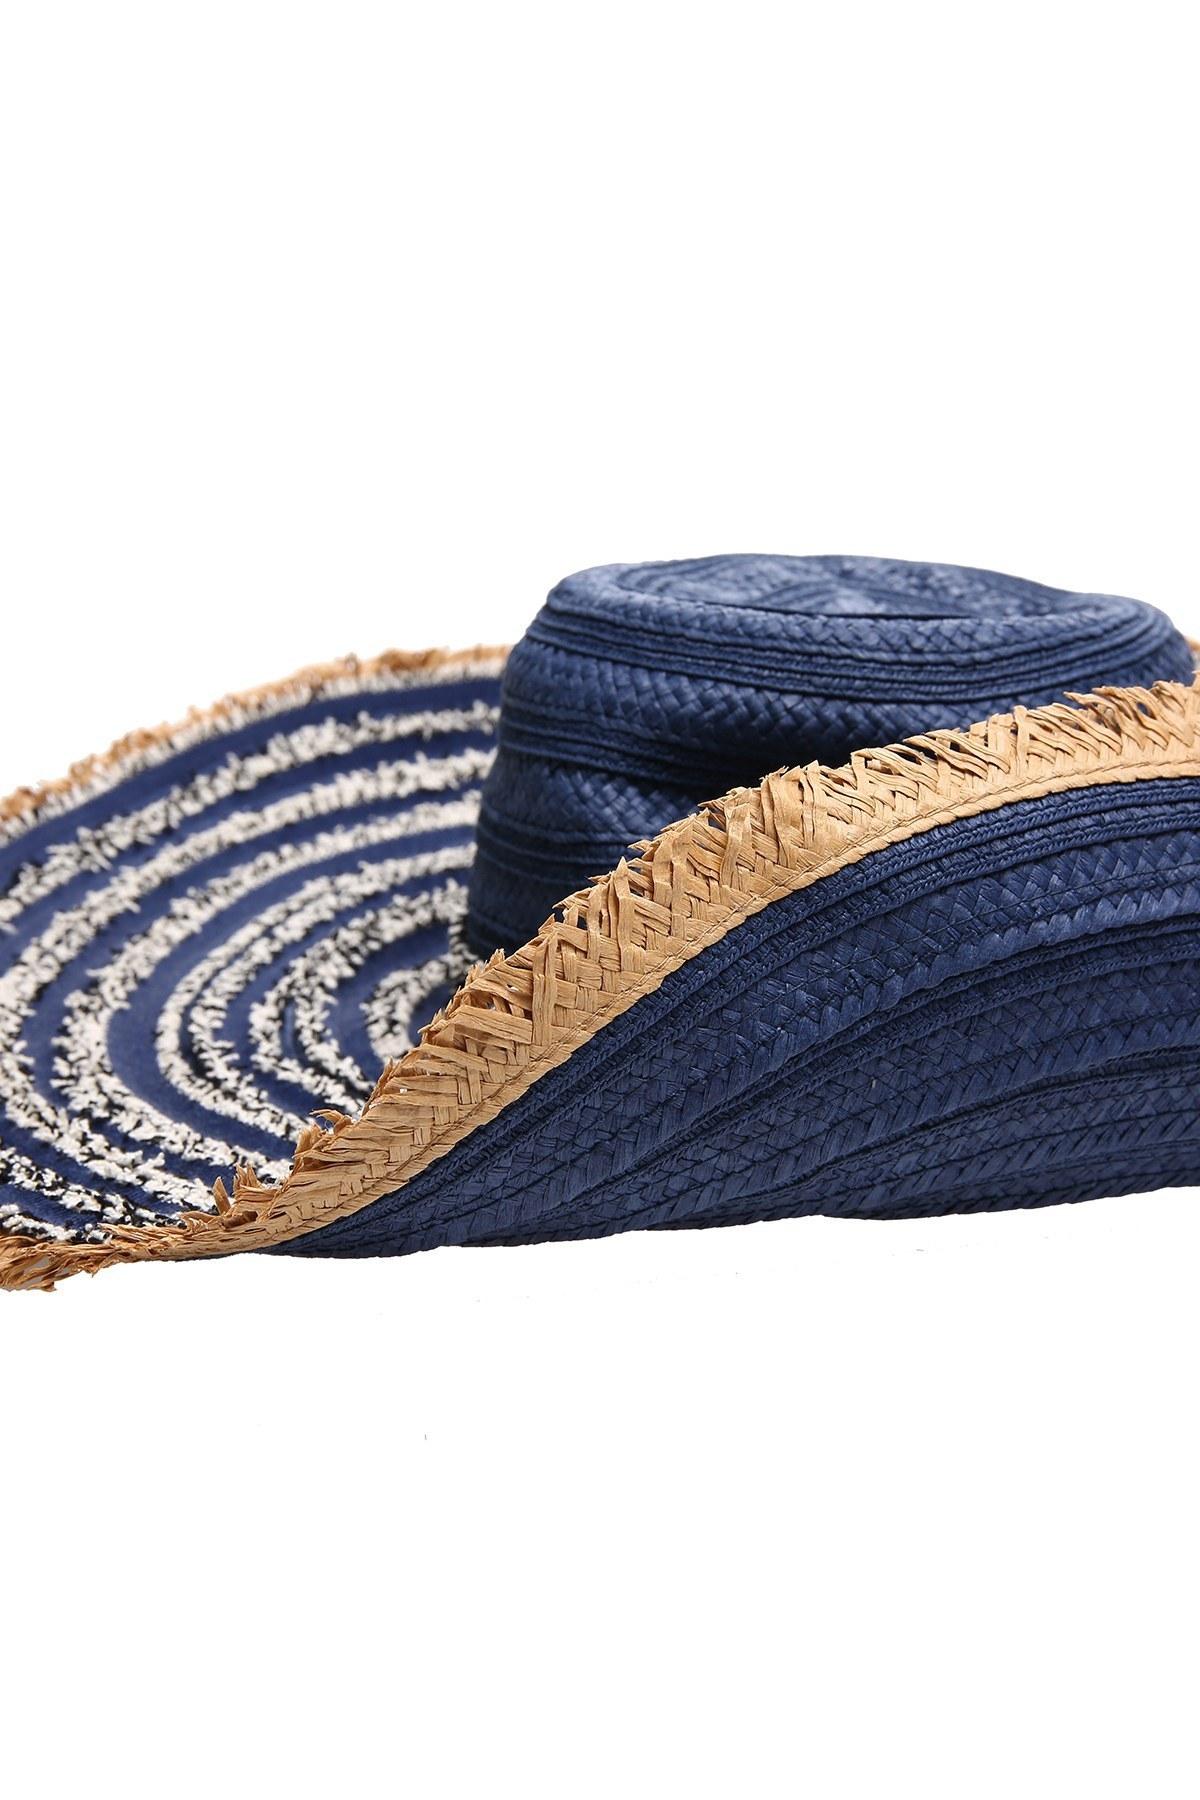 ARMANI JEANS Kadın Şapka 9241257P085